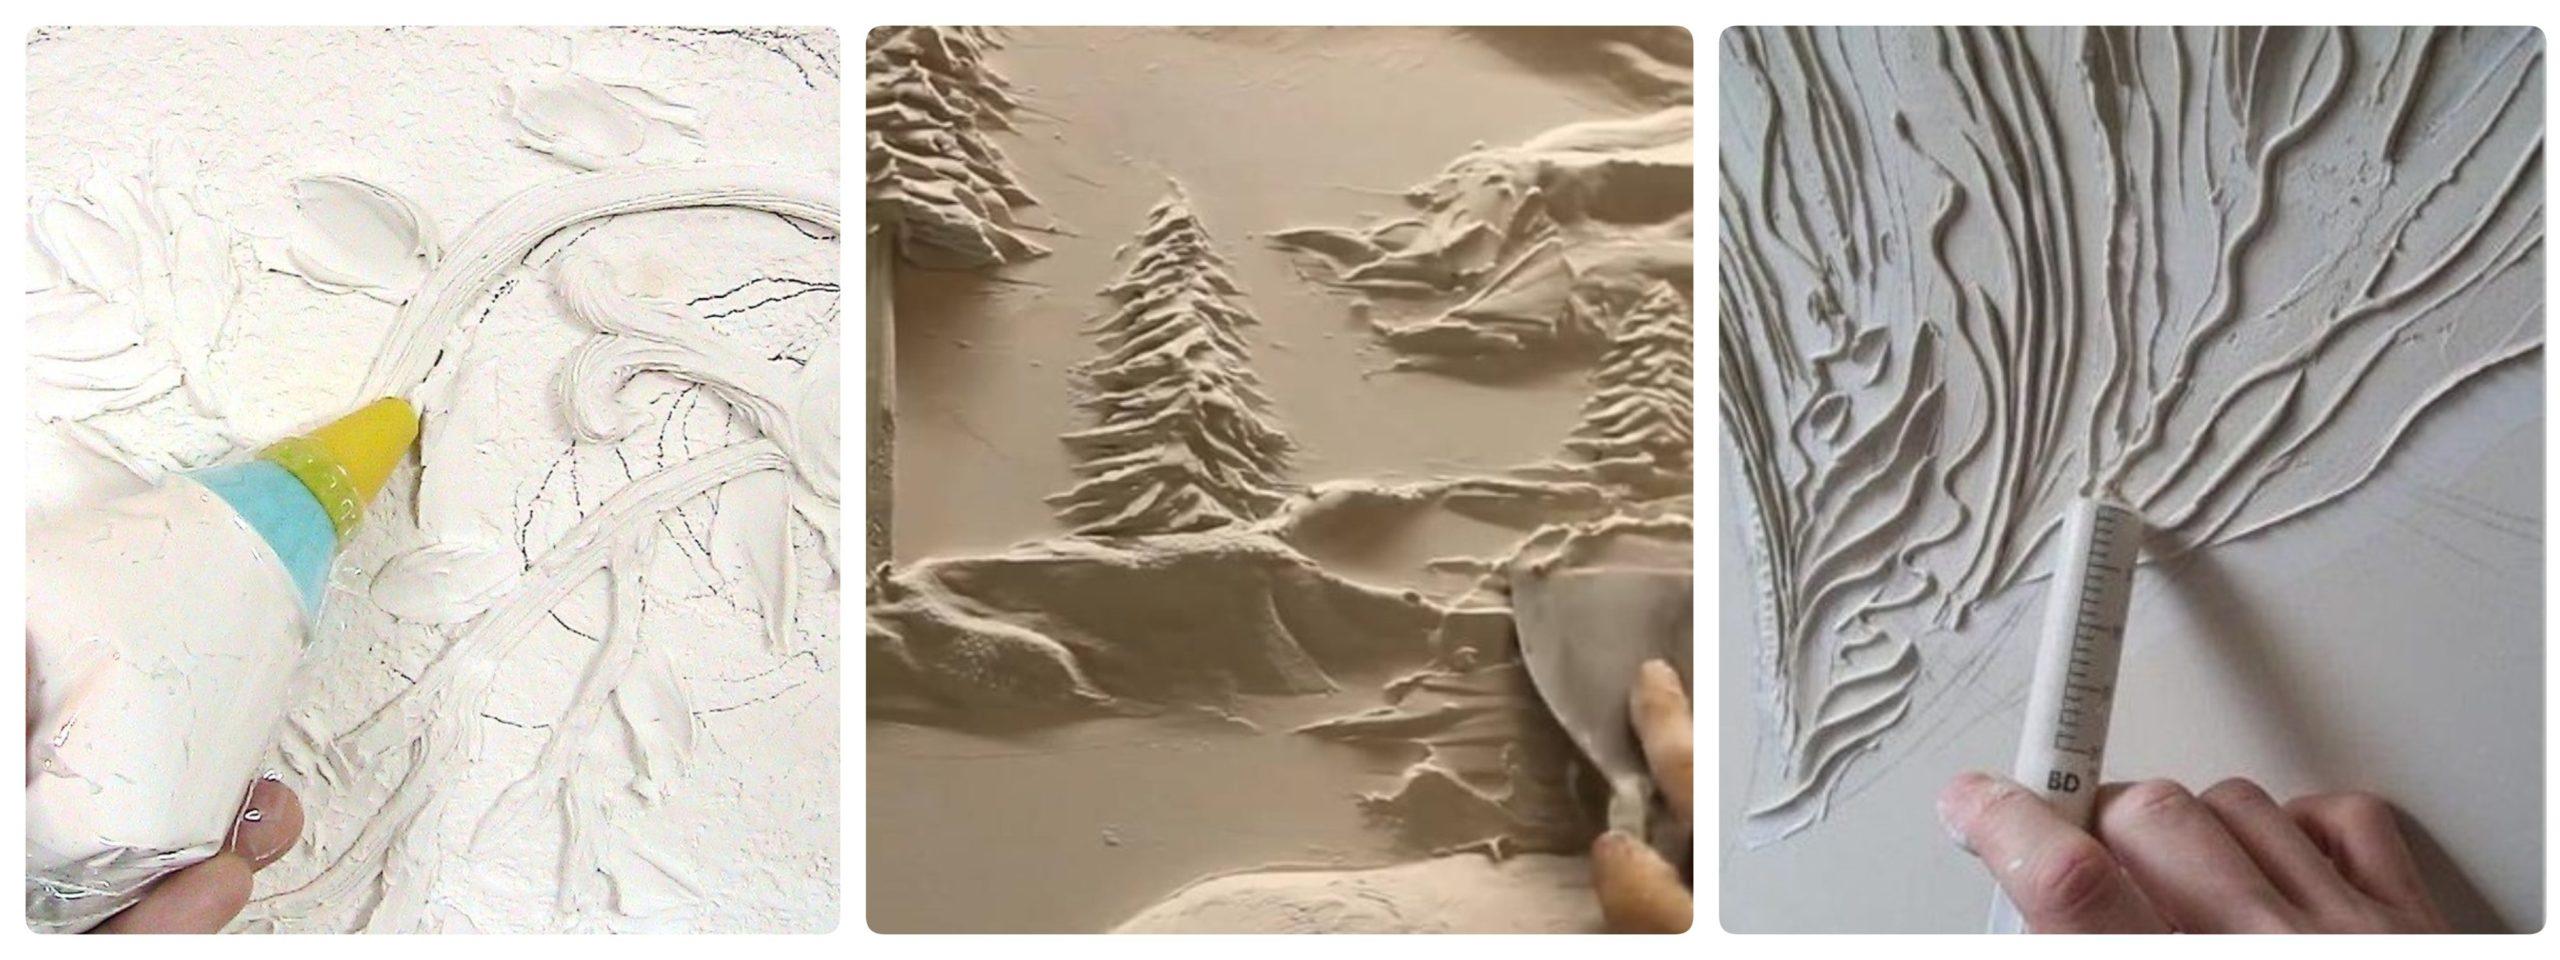 Process of wall sculpture